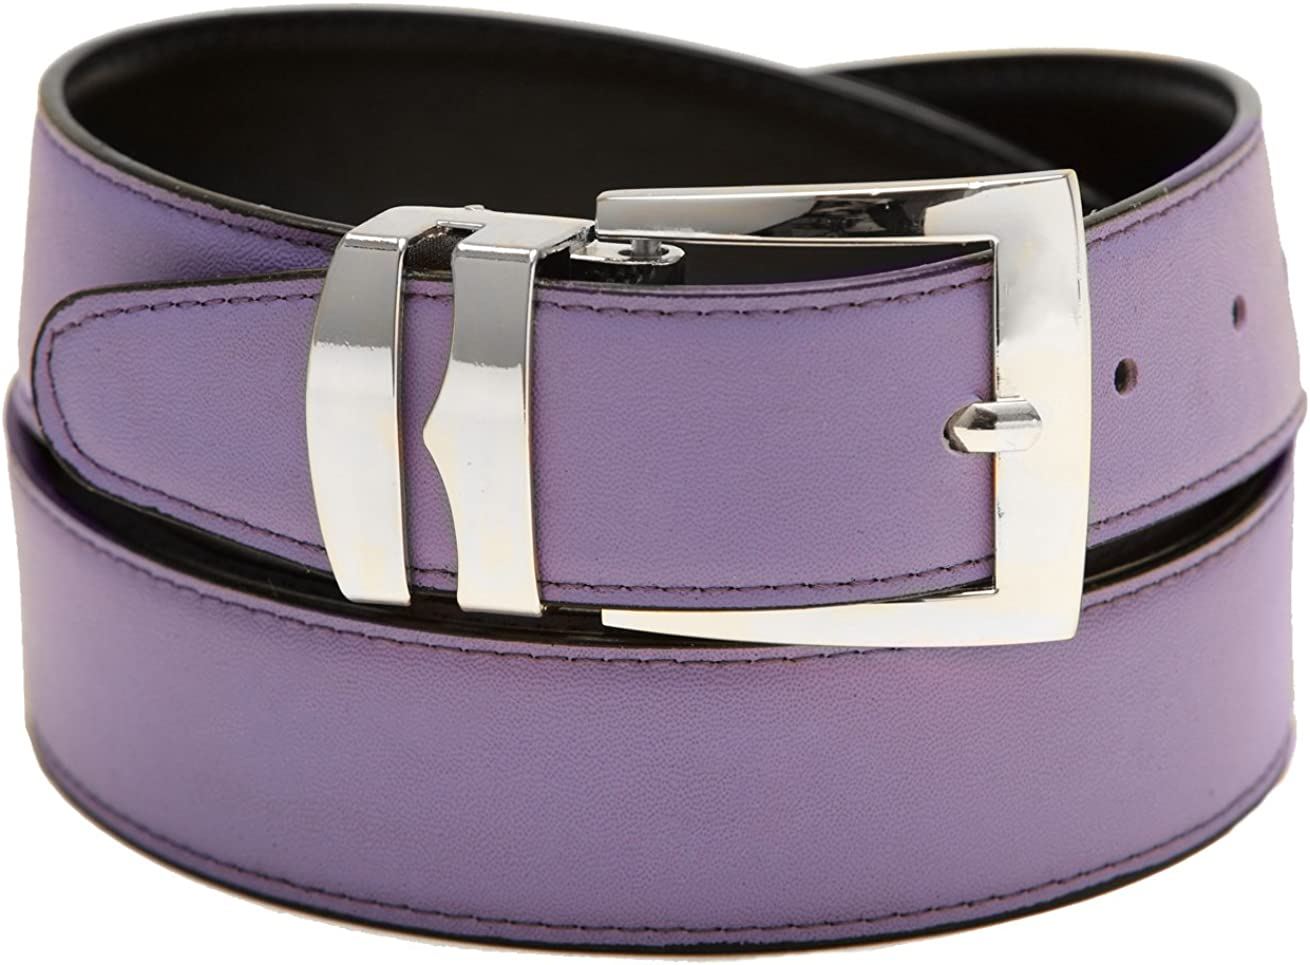 Mens Belt Reversible Wide Bonded Leather Silver-Tone Buckle LILAC//Black